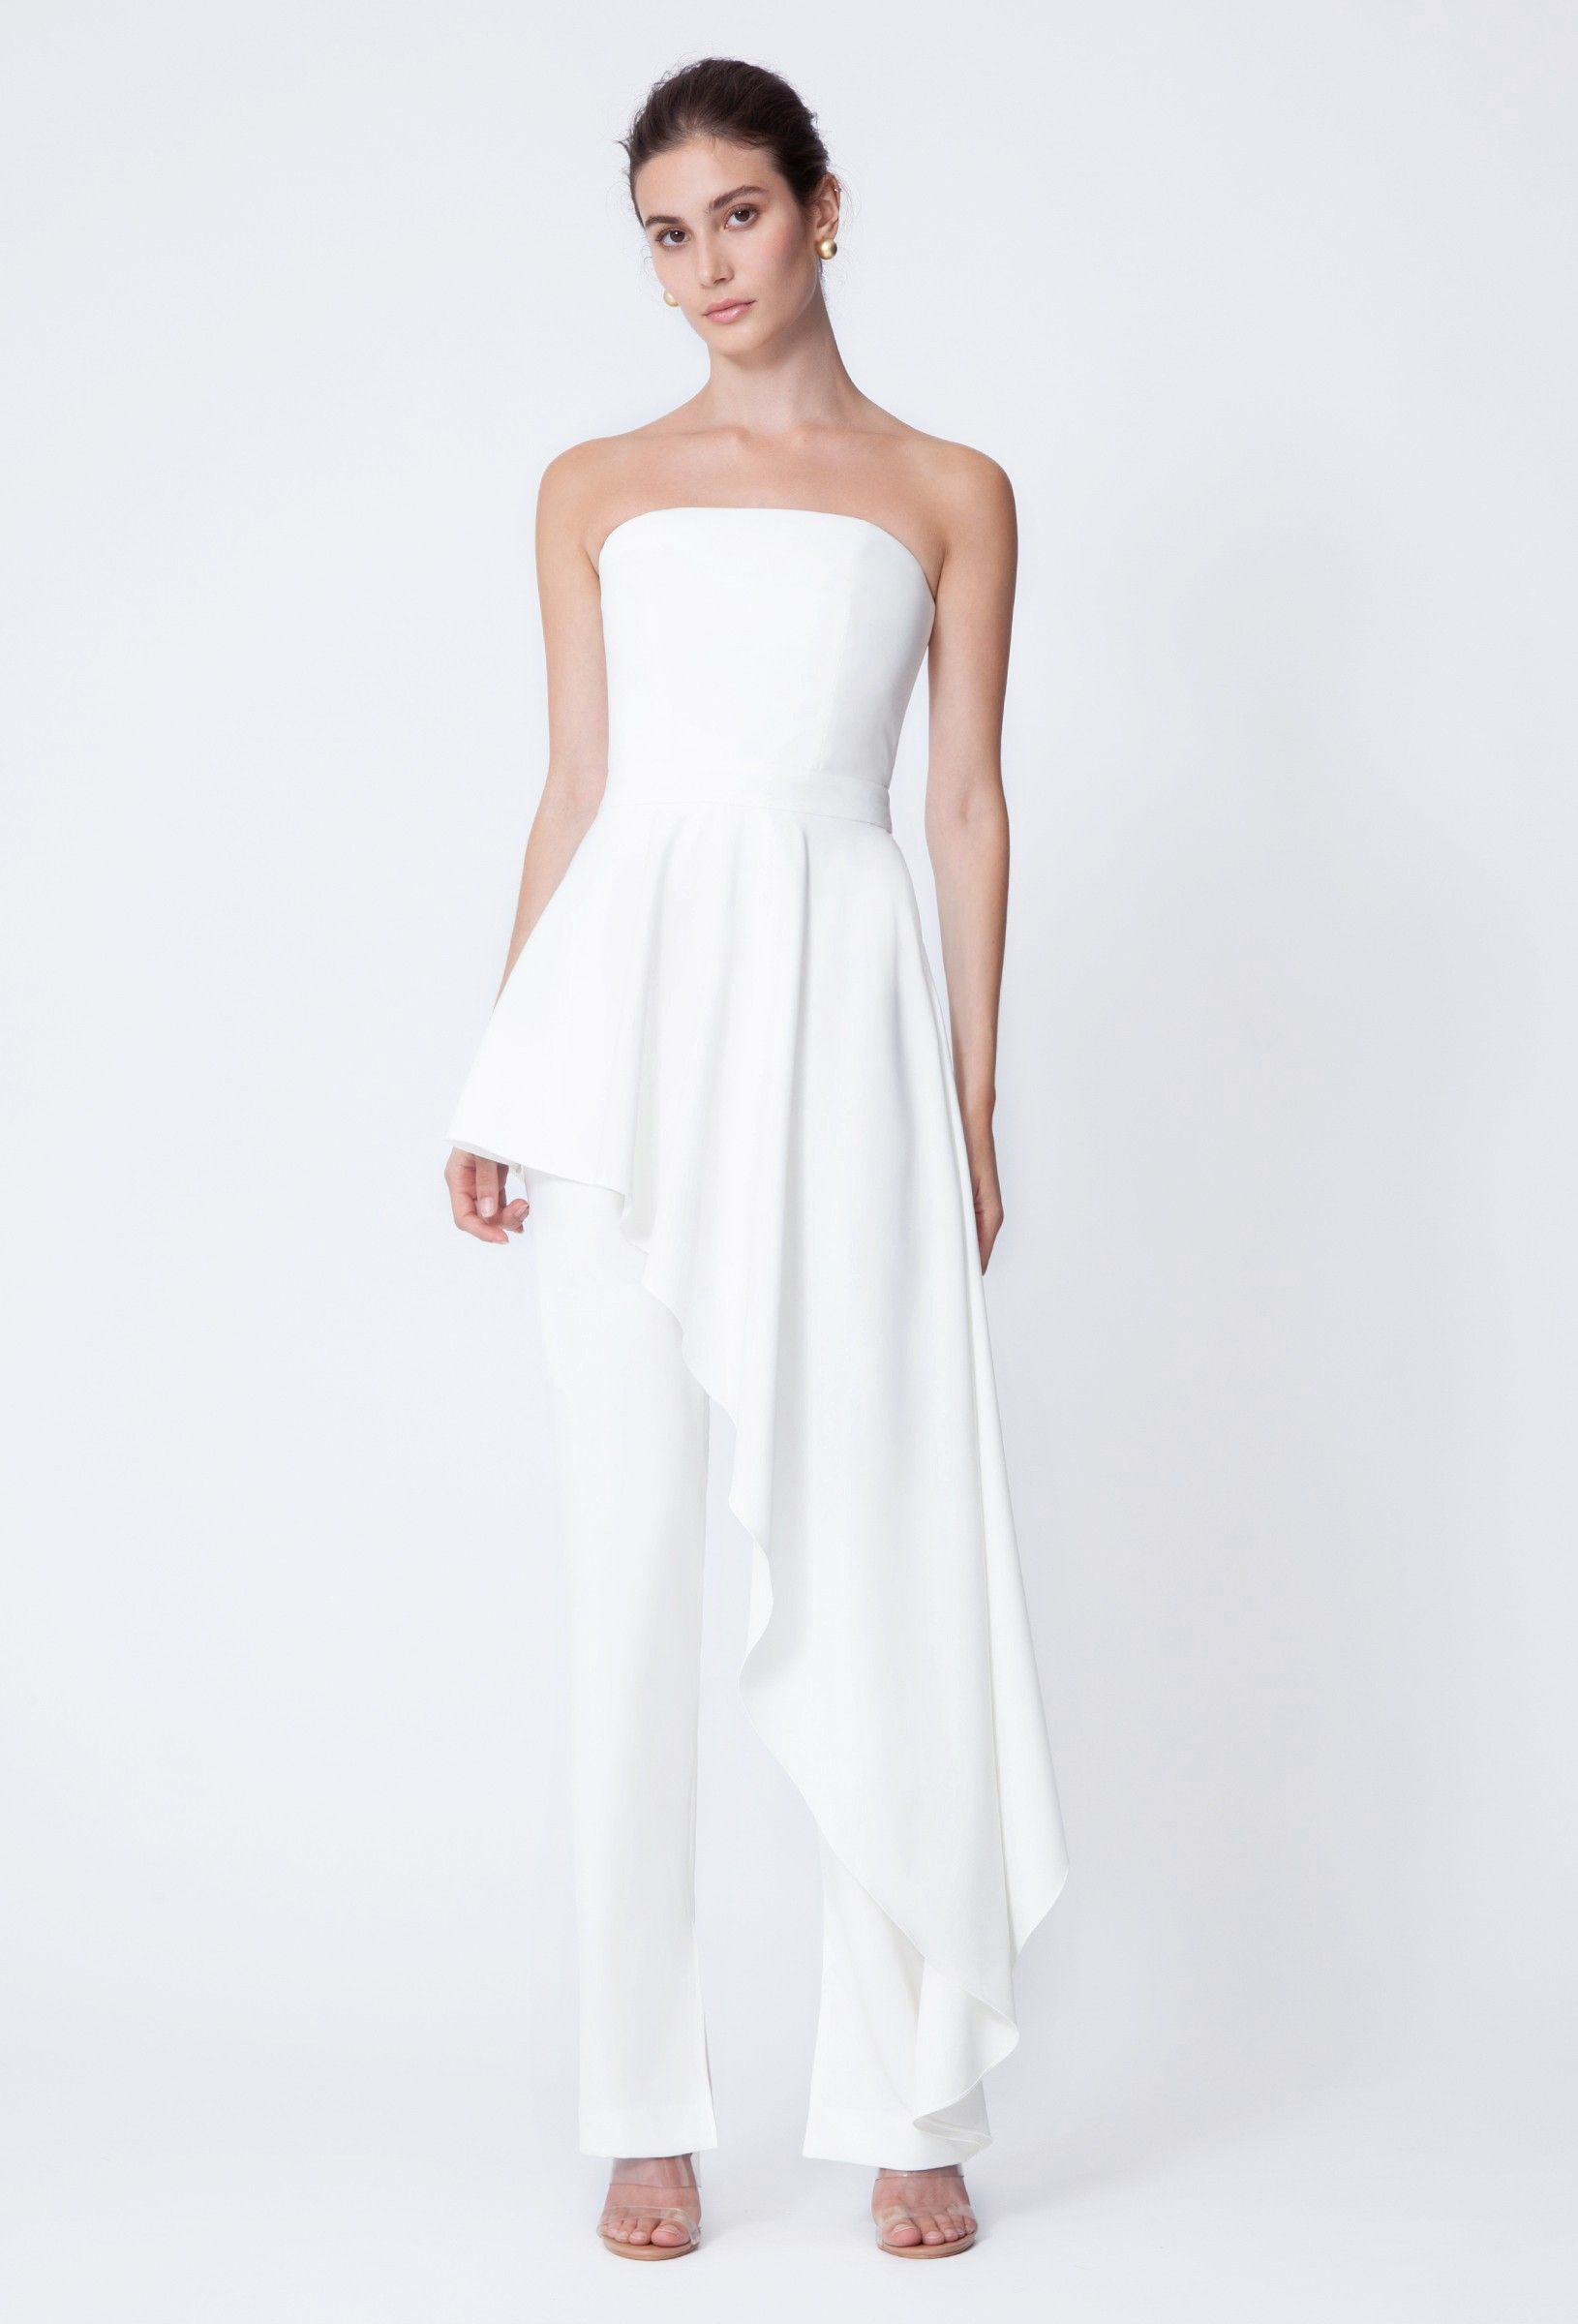 79776324fbb2 Non Formal Wedding Dresses - raveitsafe